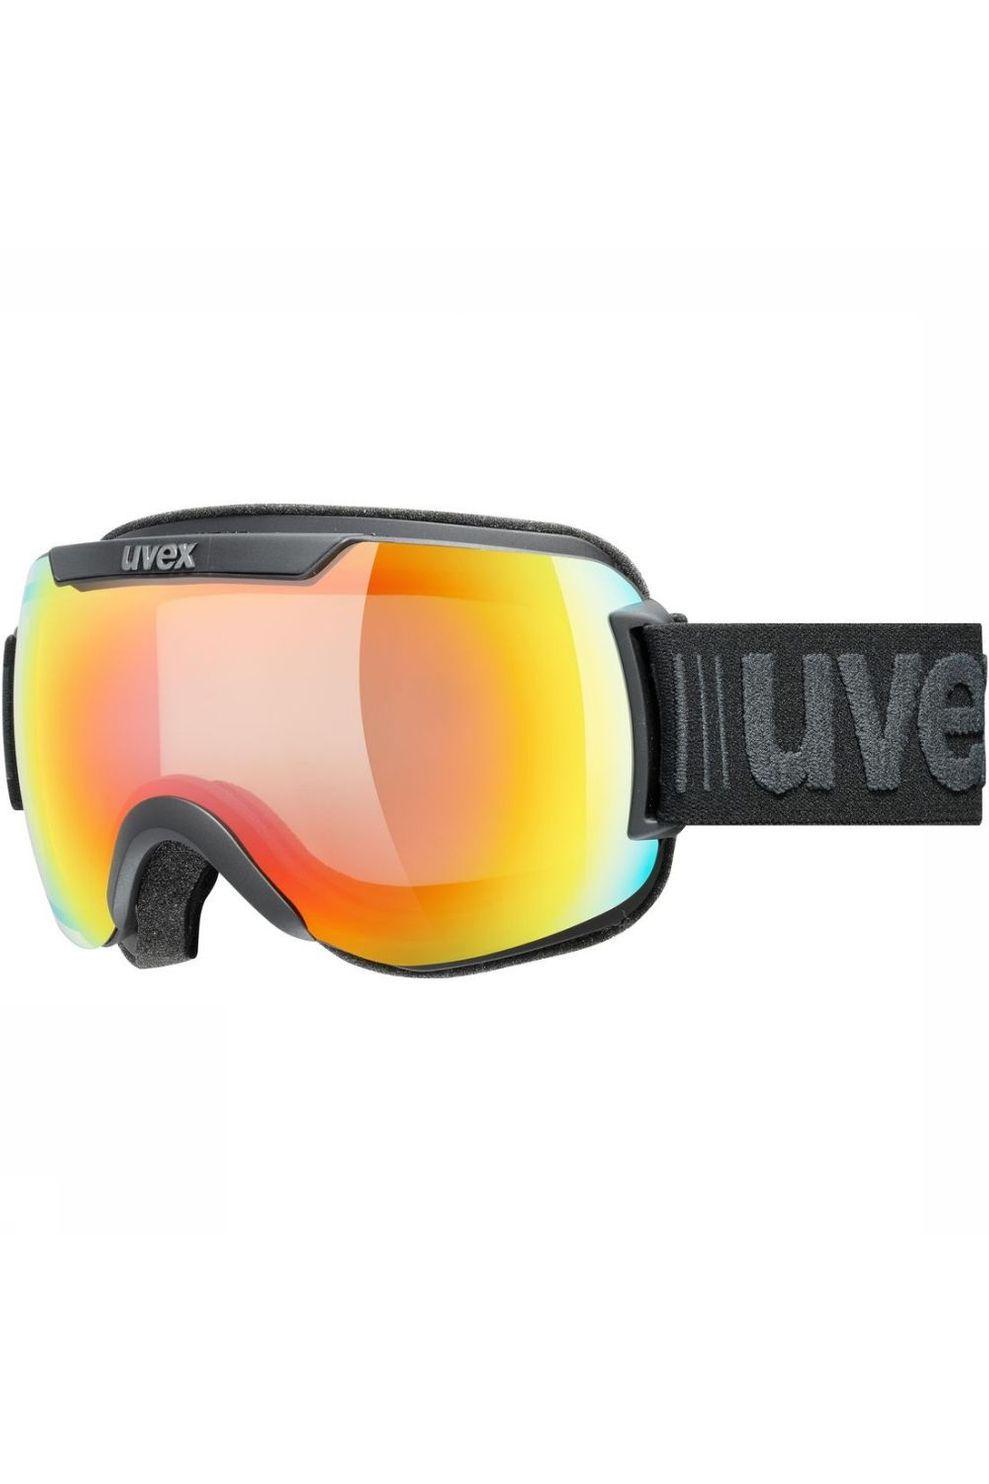 Uvex Skibril Downhill 2000 V voor heren - Zwart/Rood